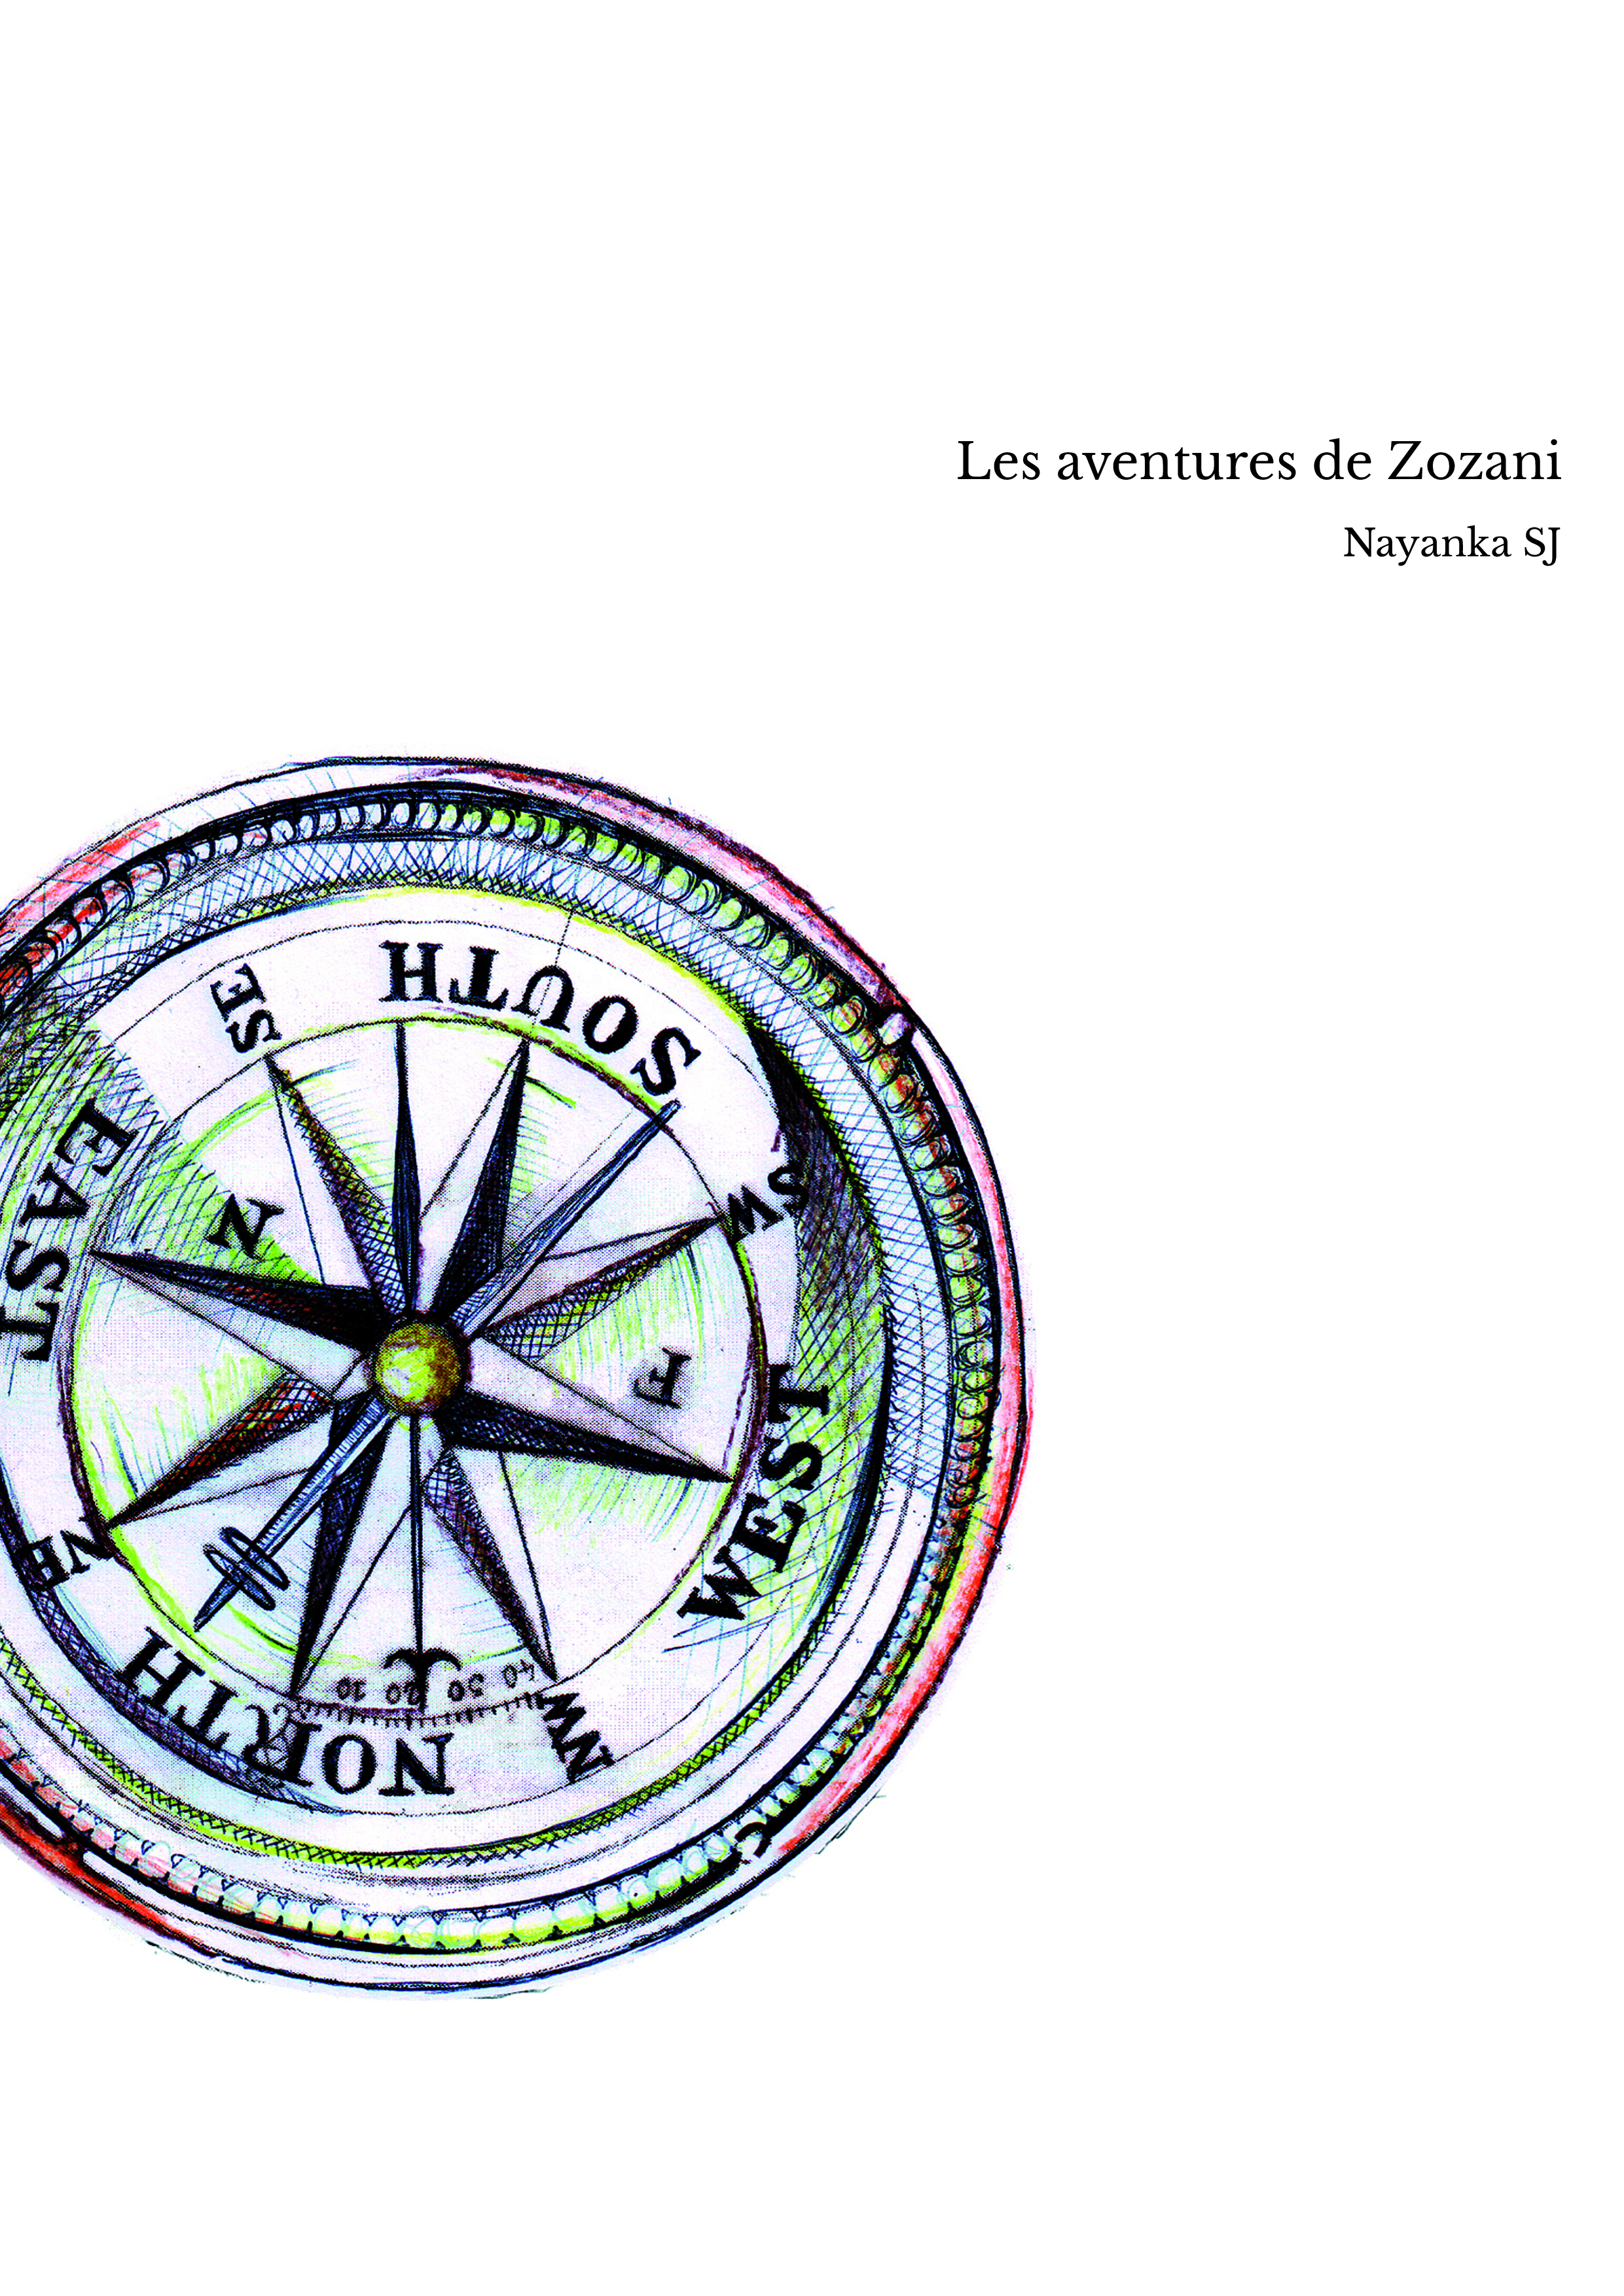 Les aventures de Zozani